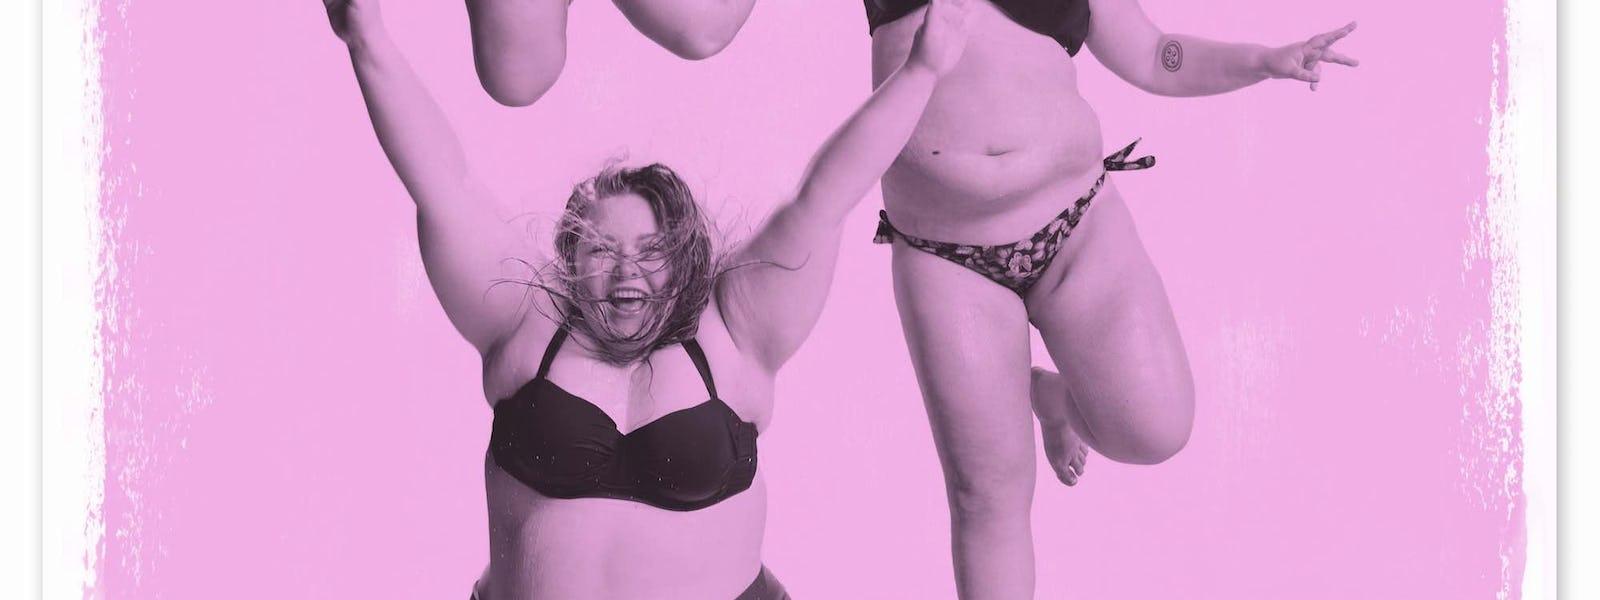 Bild - Doc Lounge: Fat Front